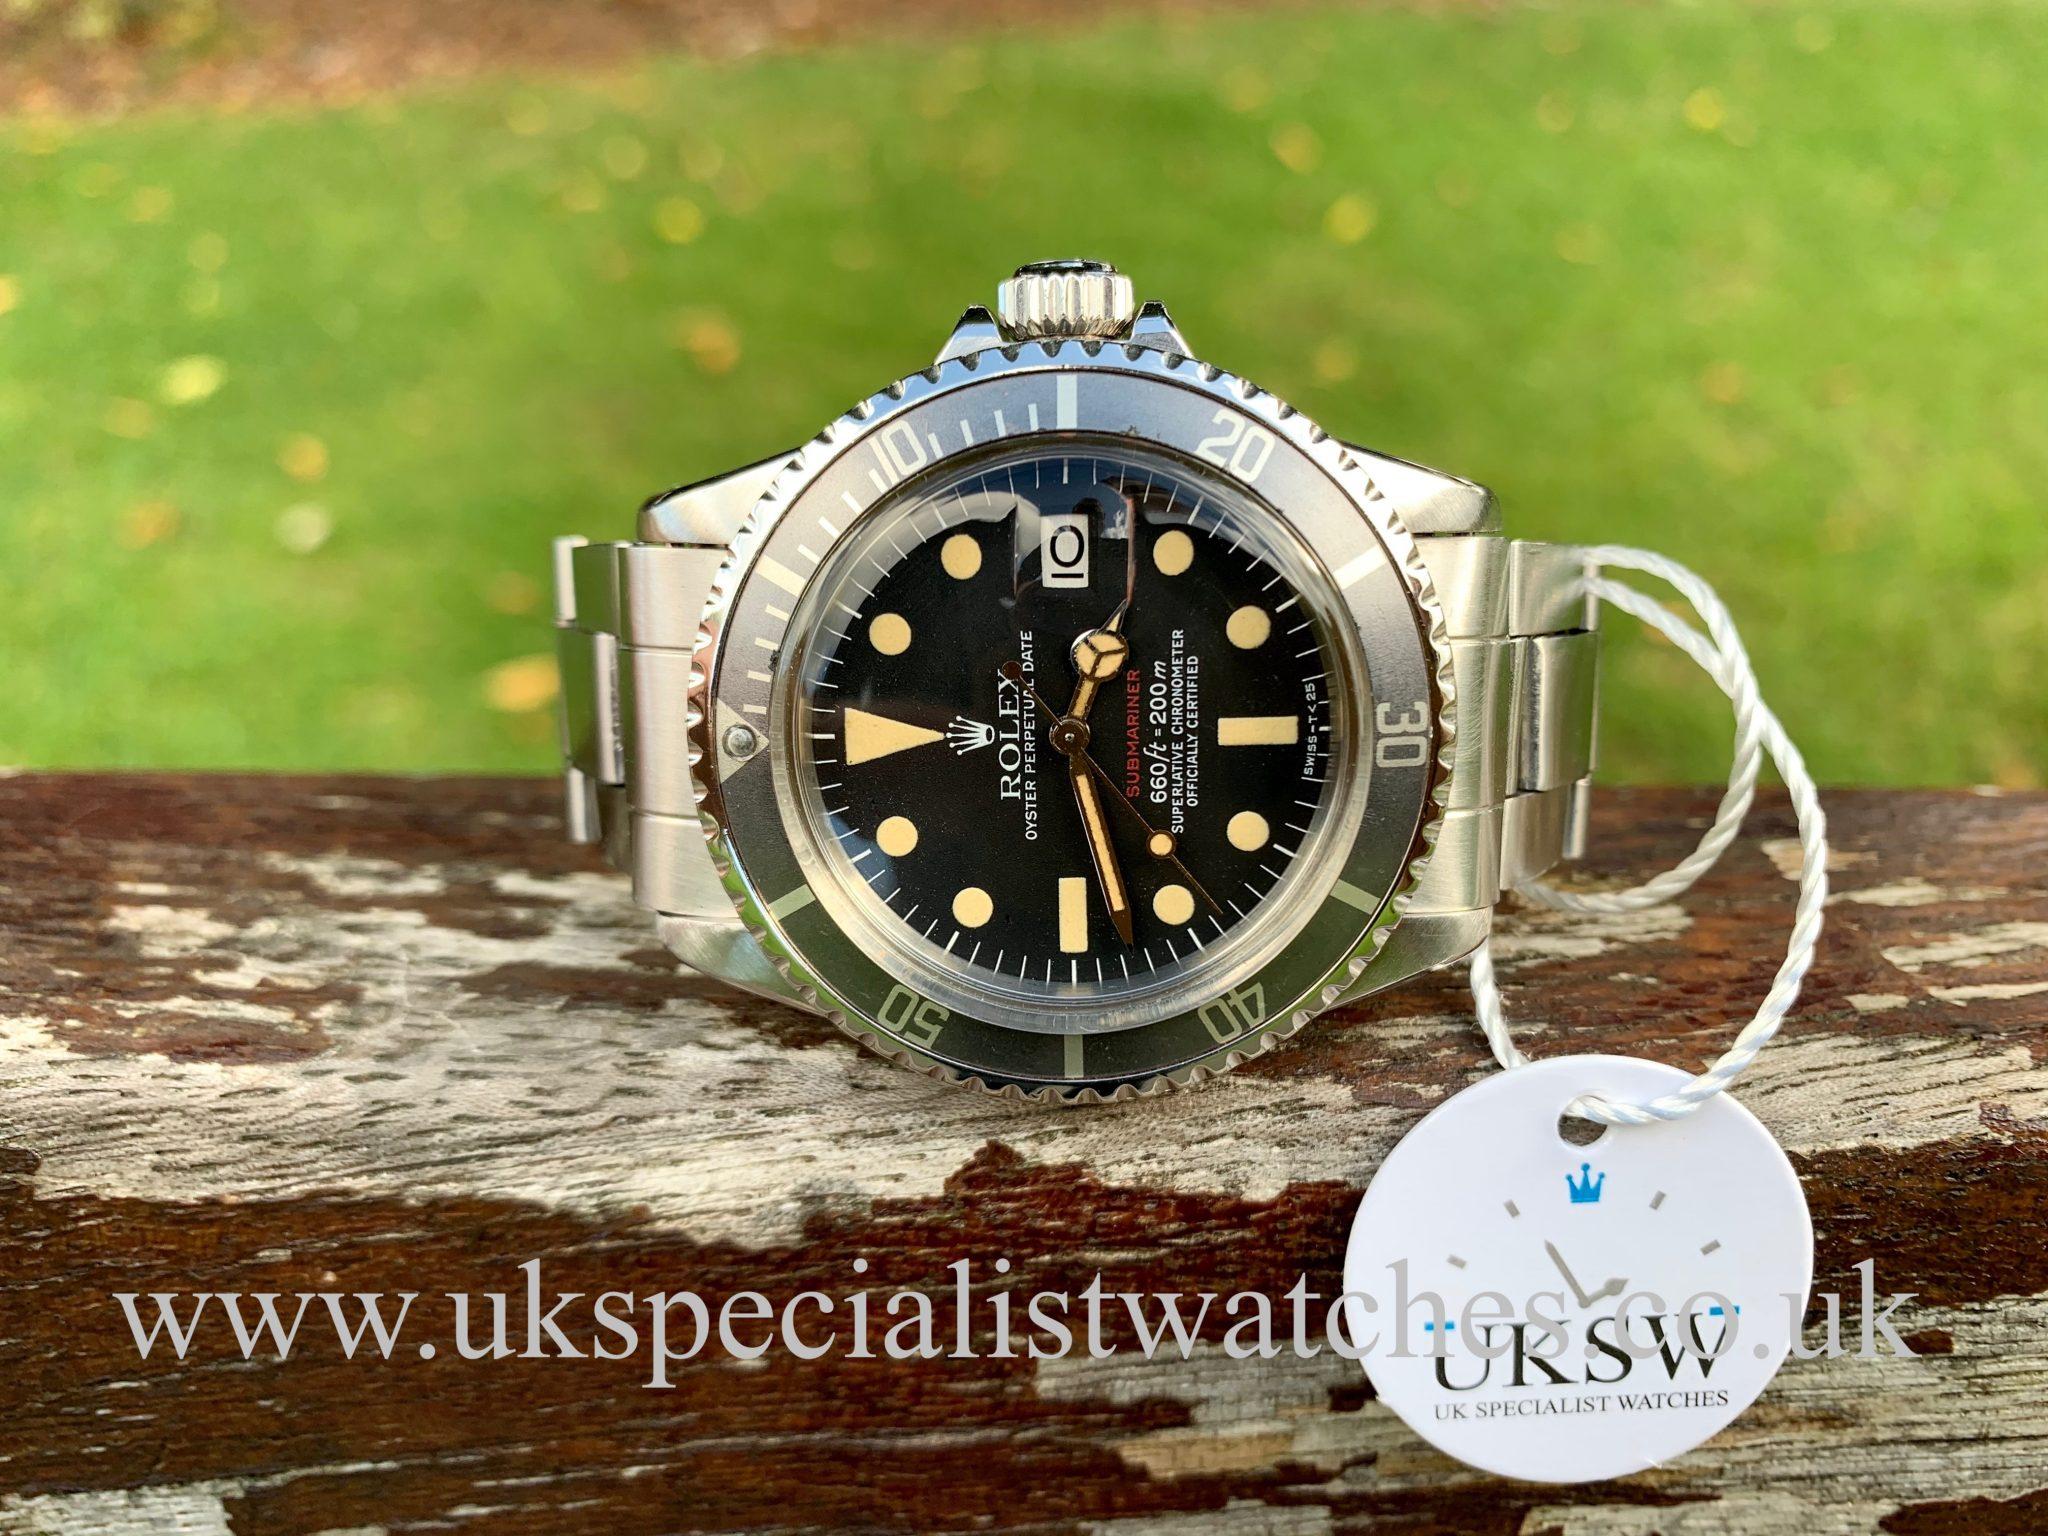 Rolex Submariner 1680 Single Red Writing MK VI - 1974 Vintage